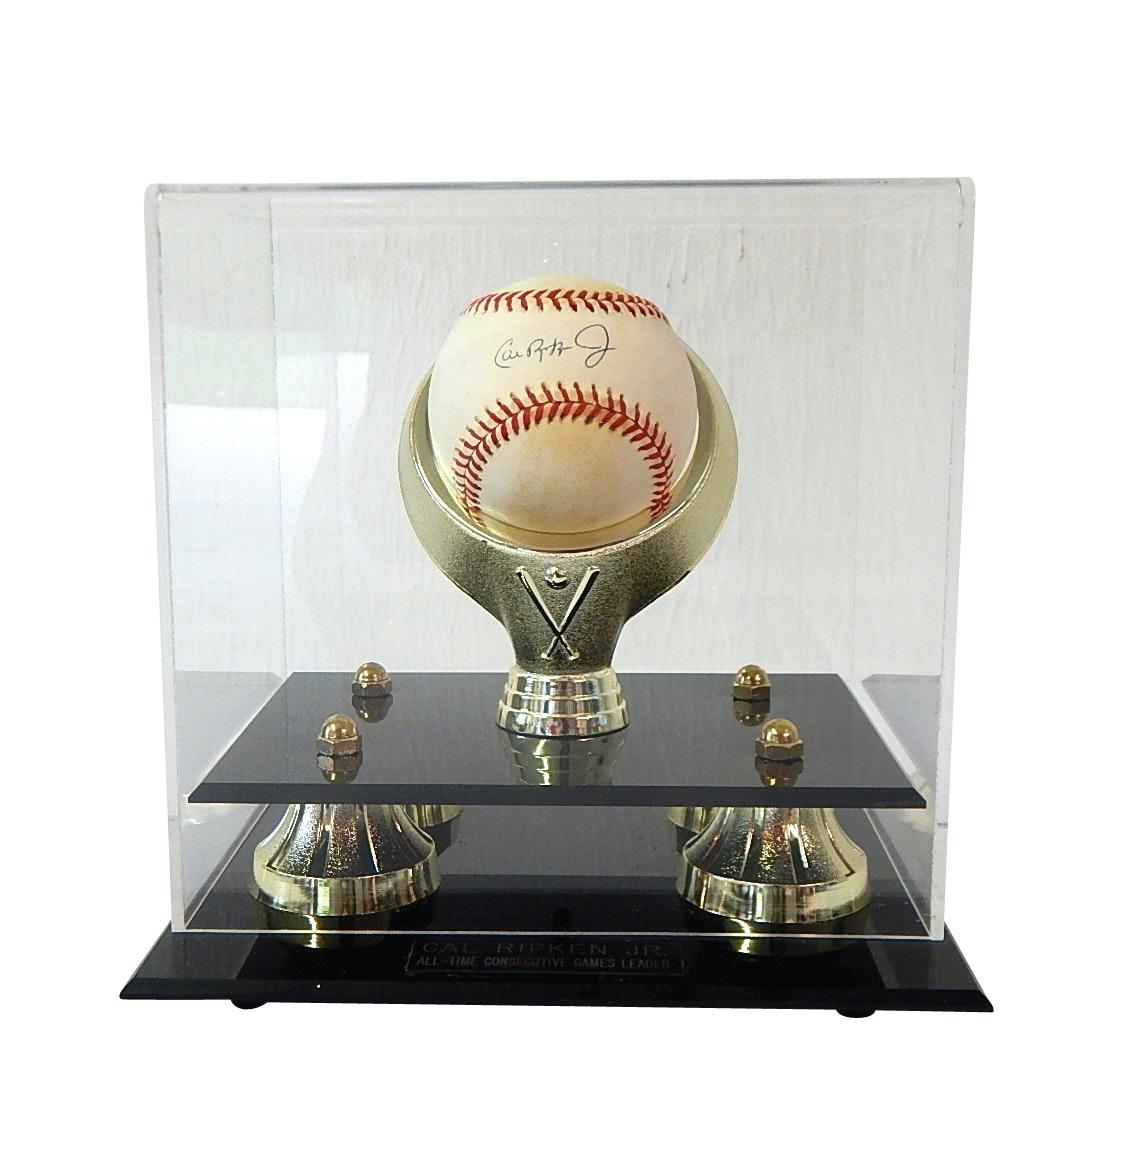 HOF Cal Ripken Jr. Signed Baseball - All-Time Consecutive Games Leader Display